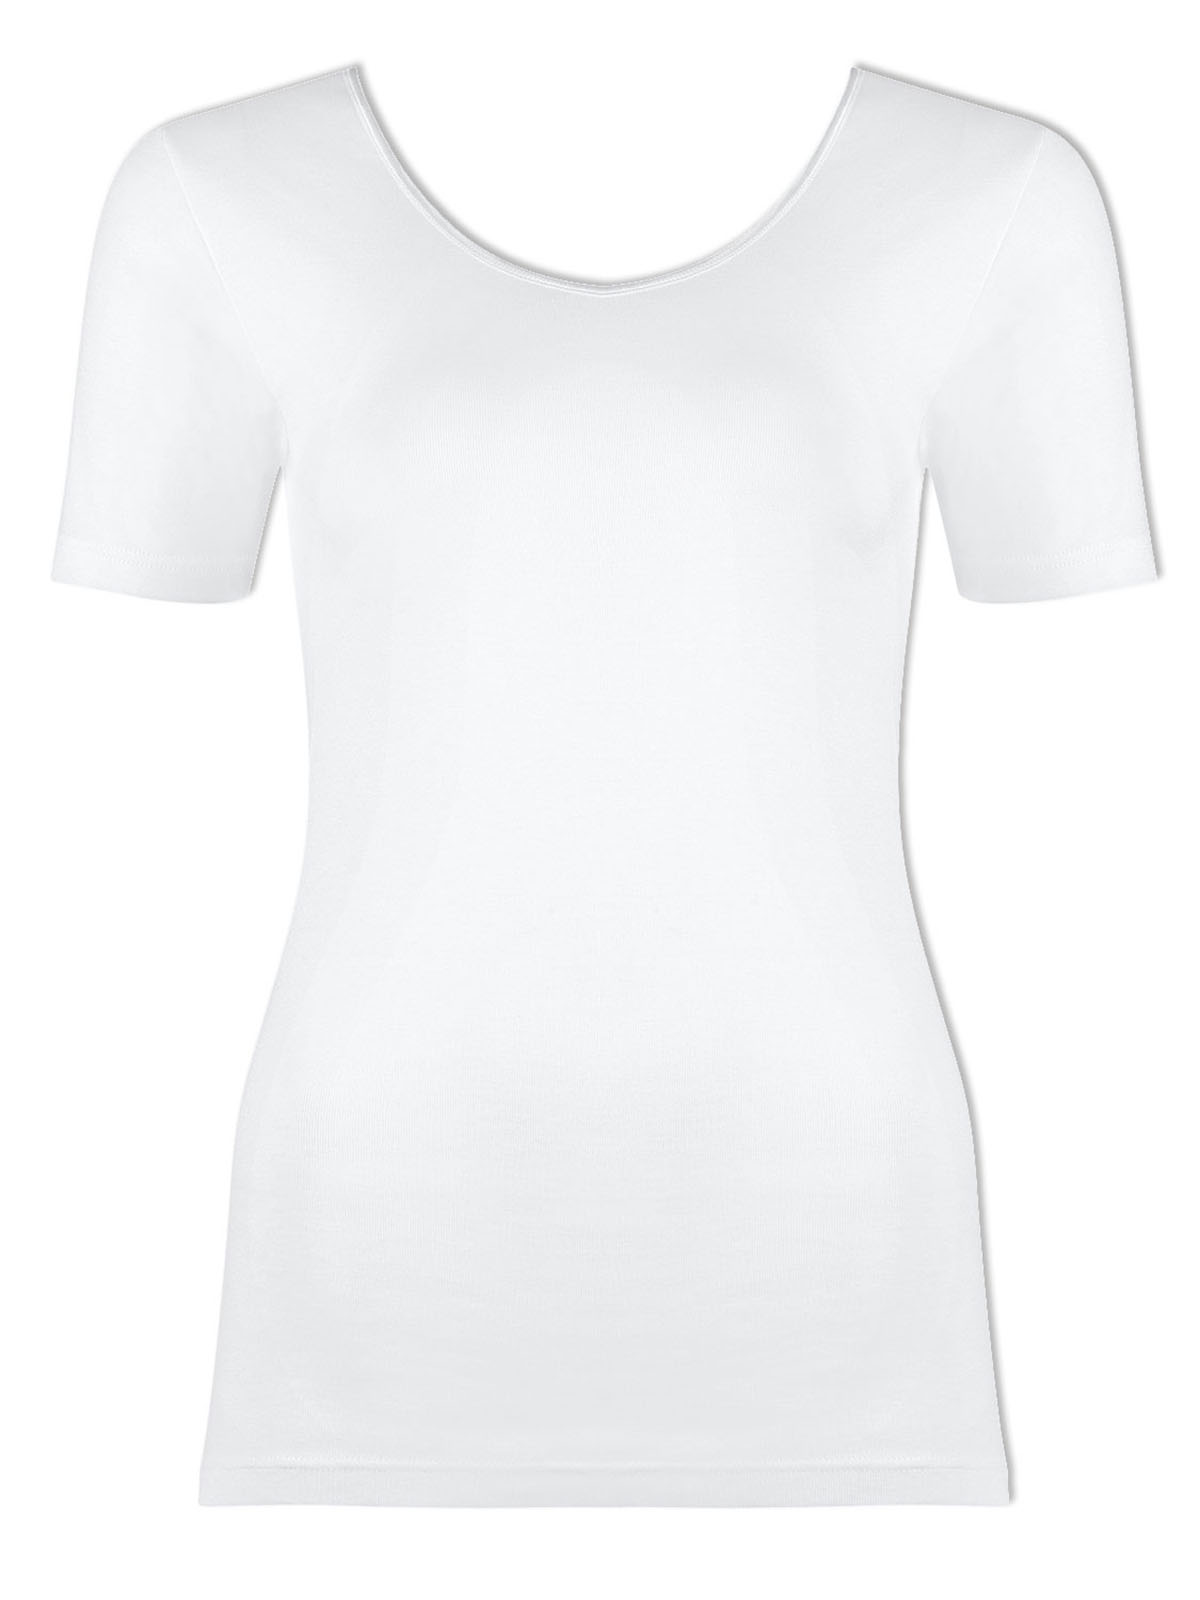 NATURANA Damen-Unterhemd 2522, 38-52